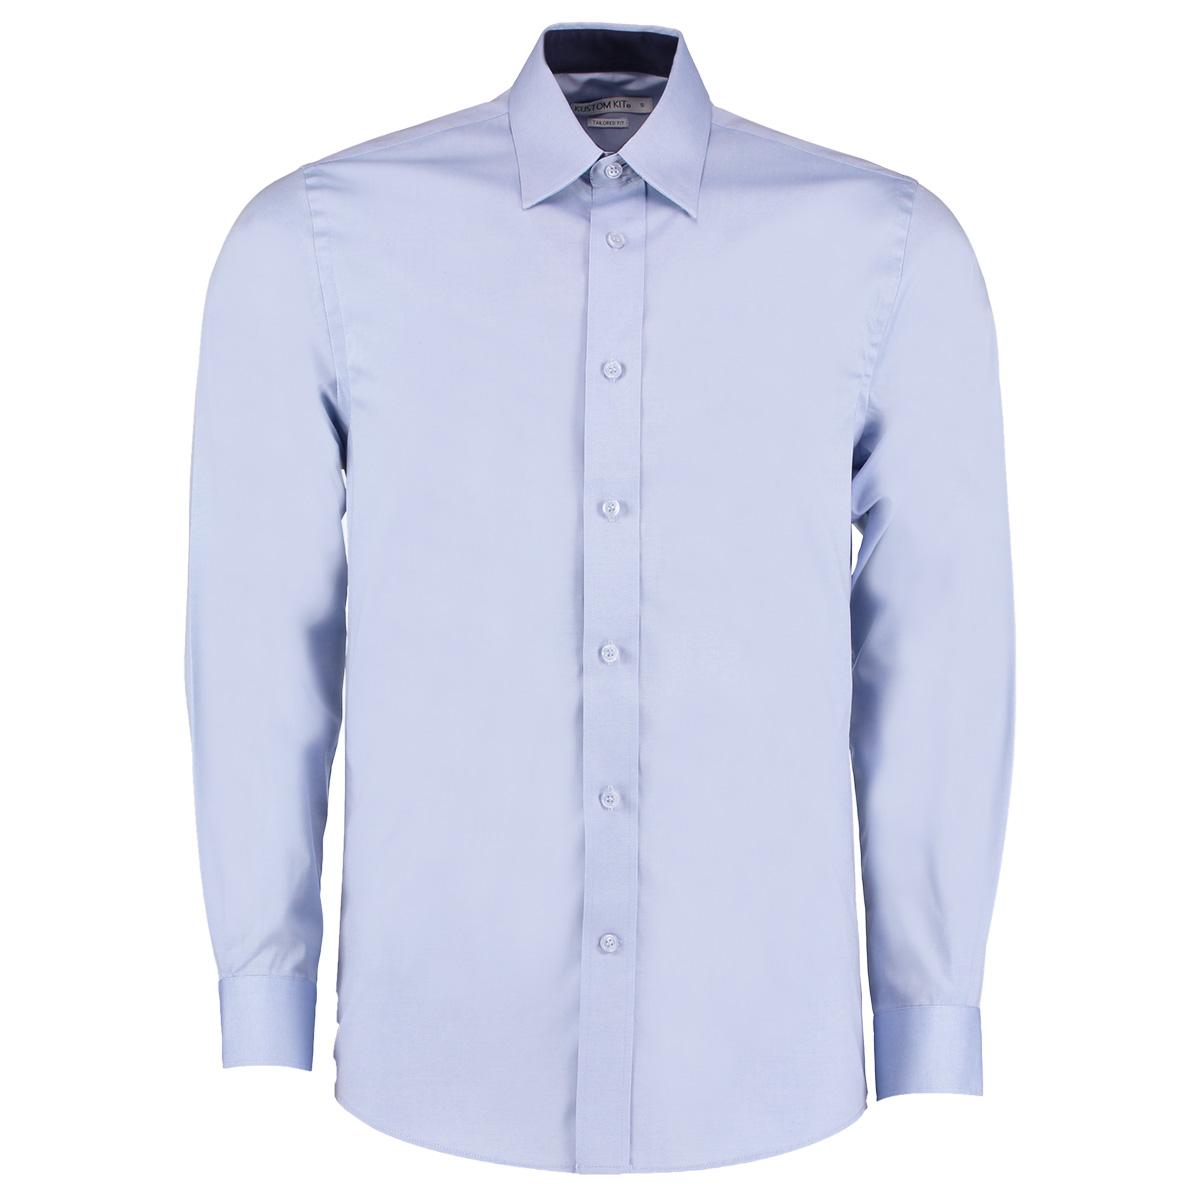 7a86f024209 KK189 Contrast Premium Oxford Shirt - Kustom Kit